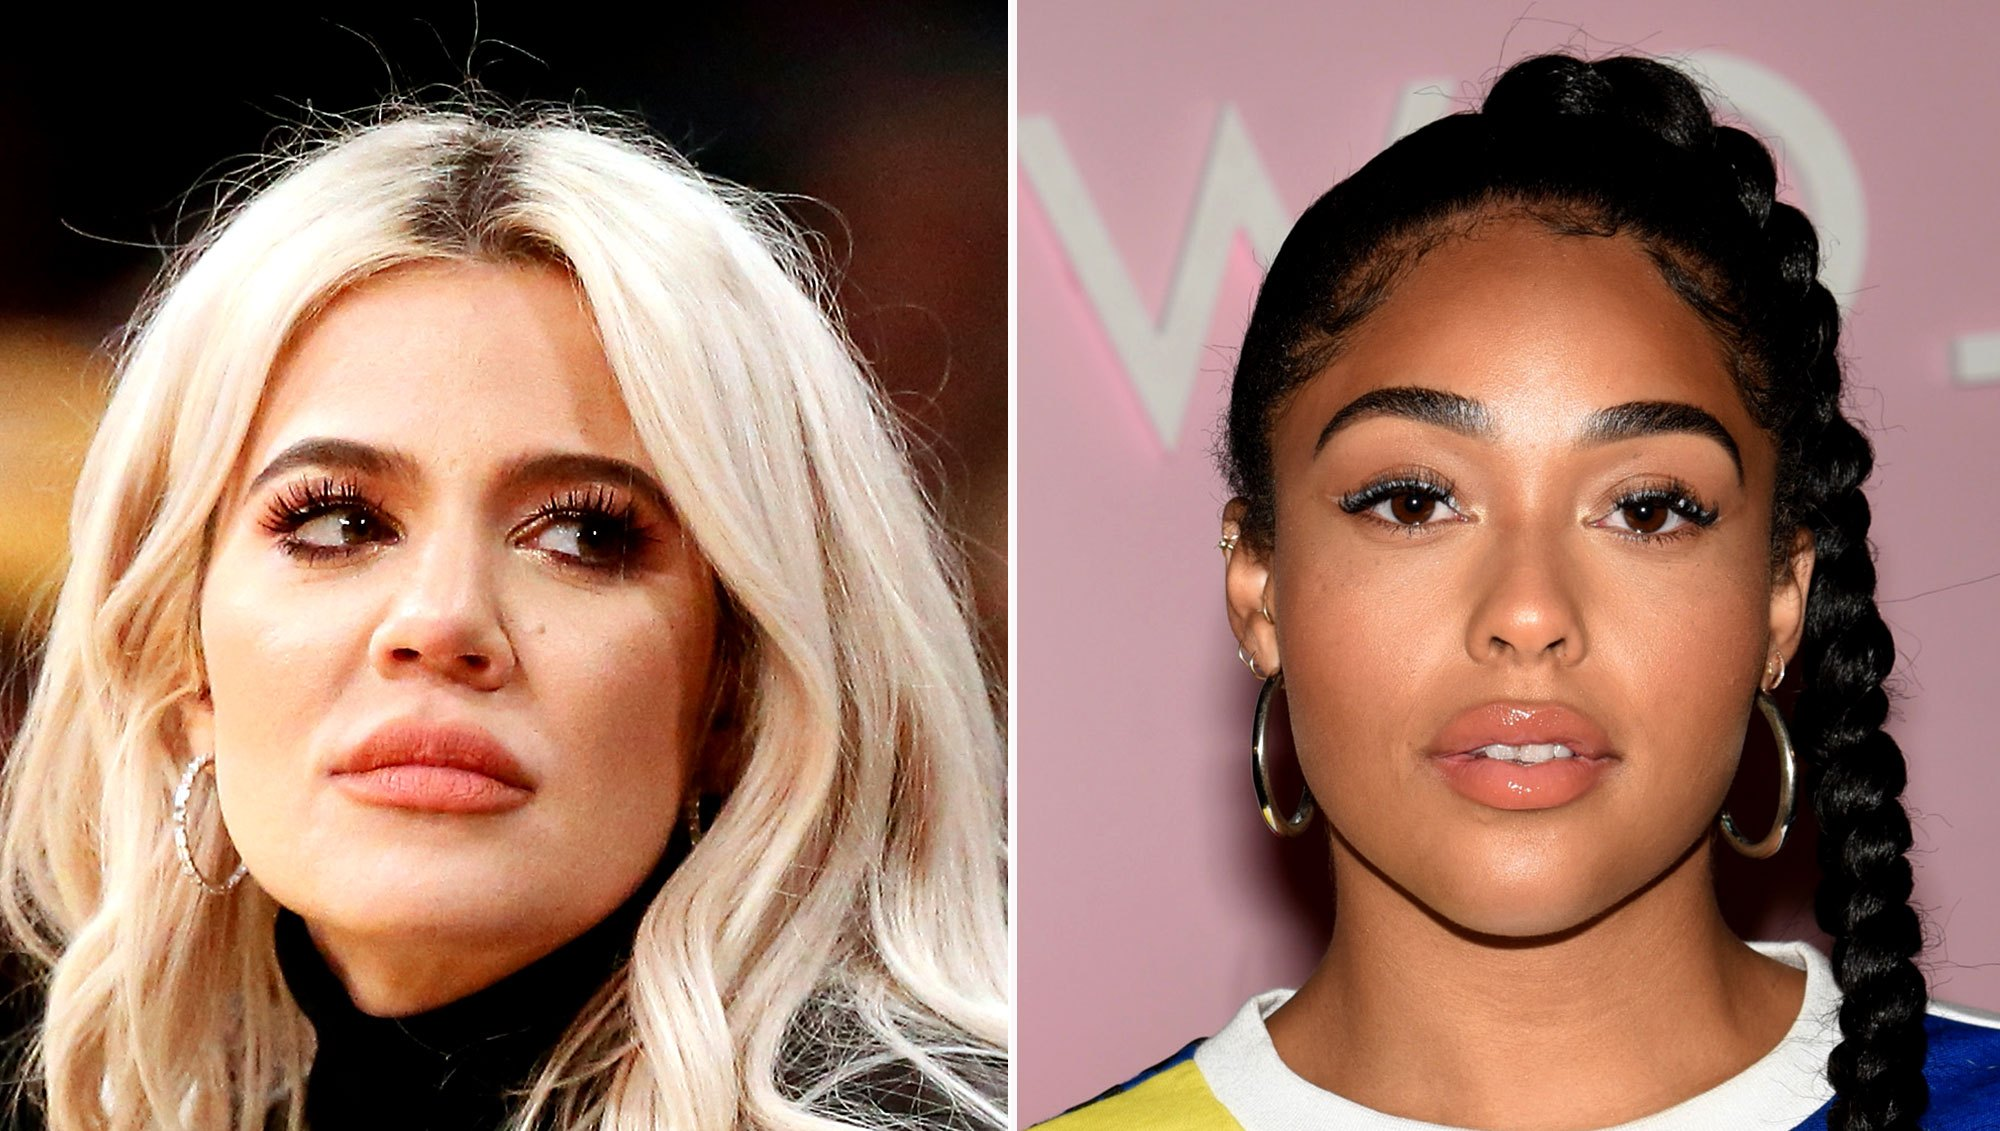 Khloe Kardashian Left Sweet Note on Jordyn Woods' Pic a Day Before Drama